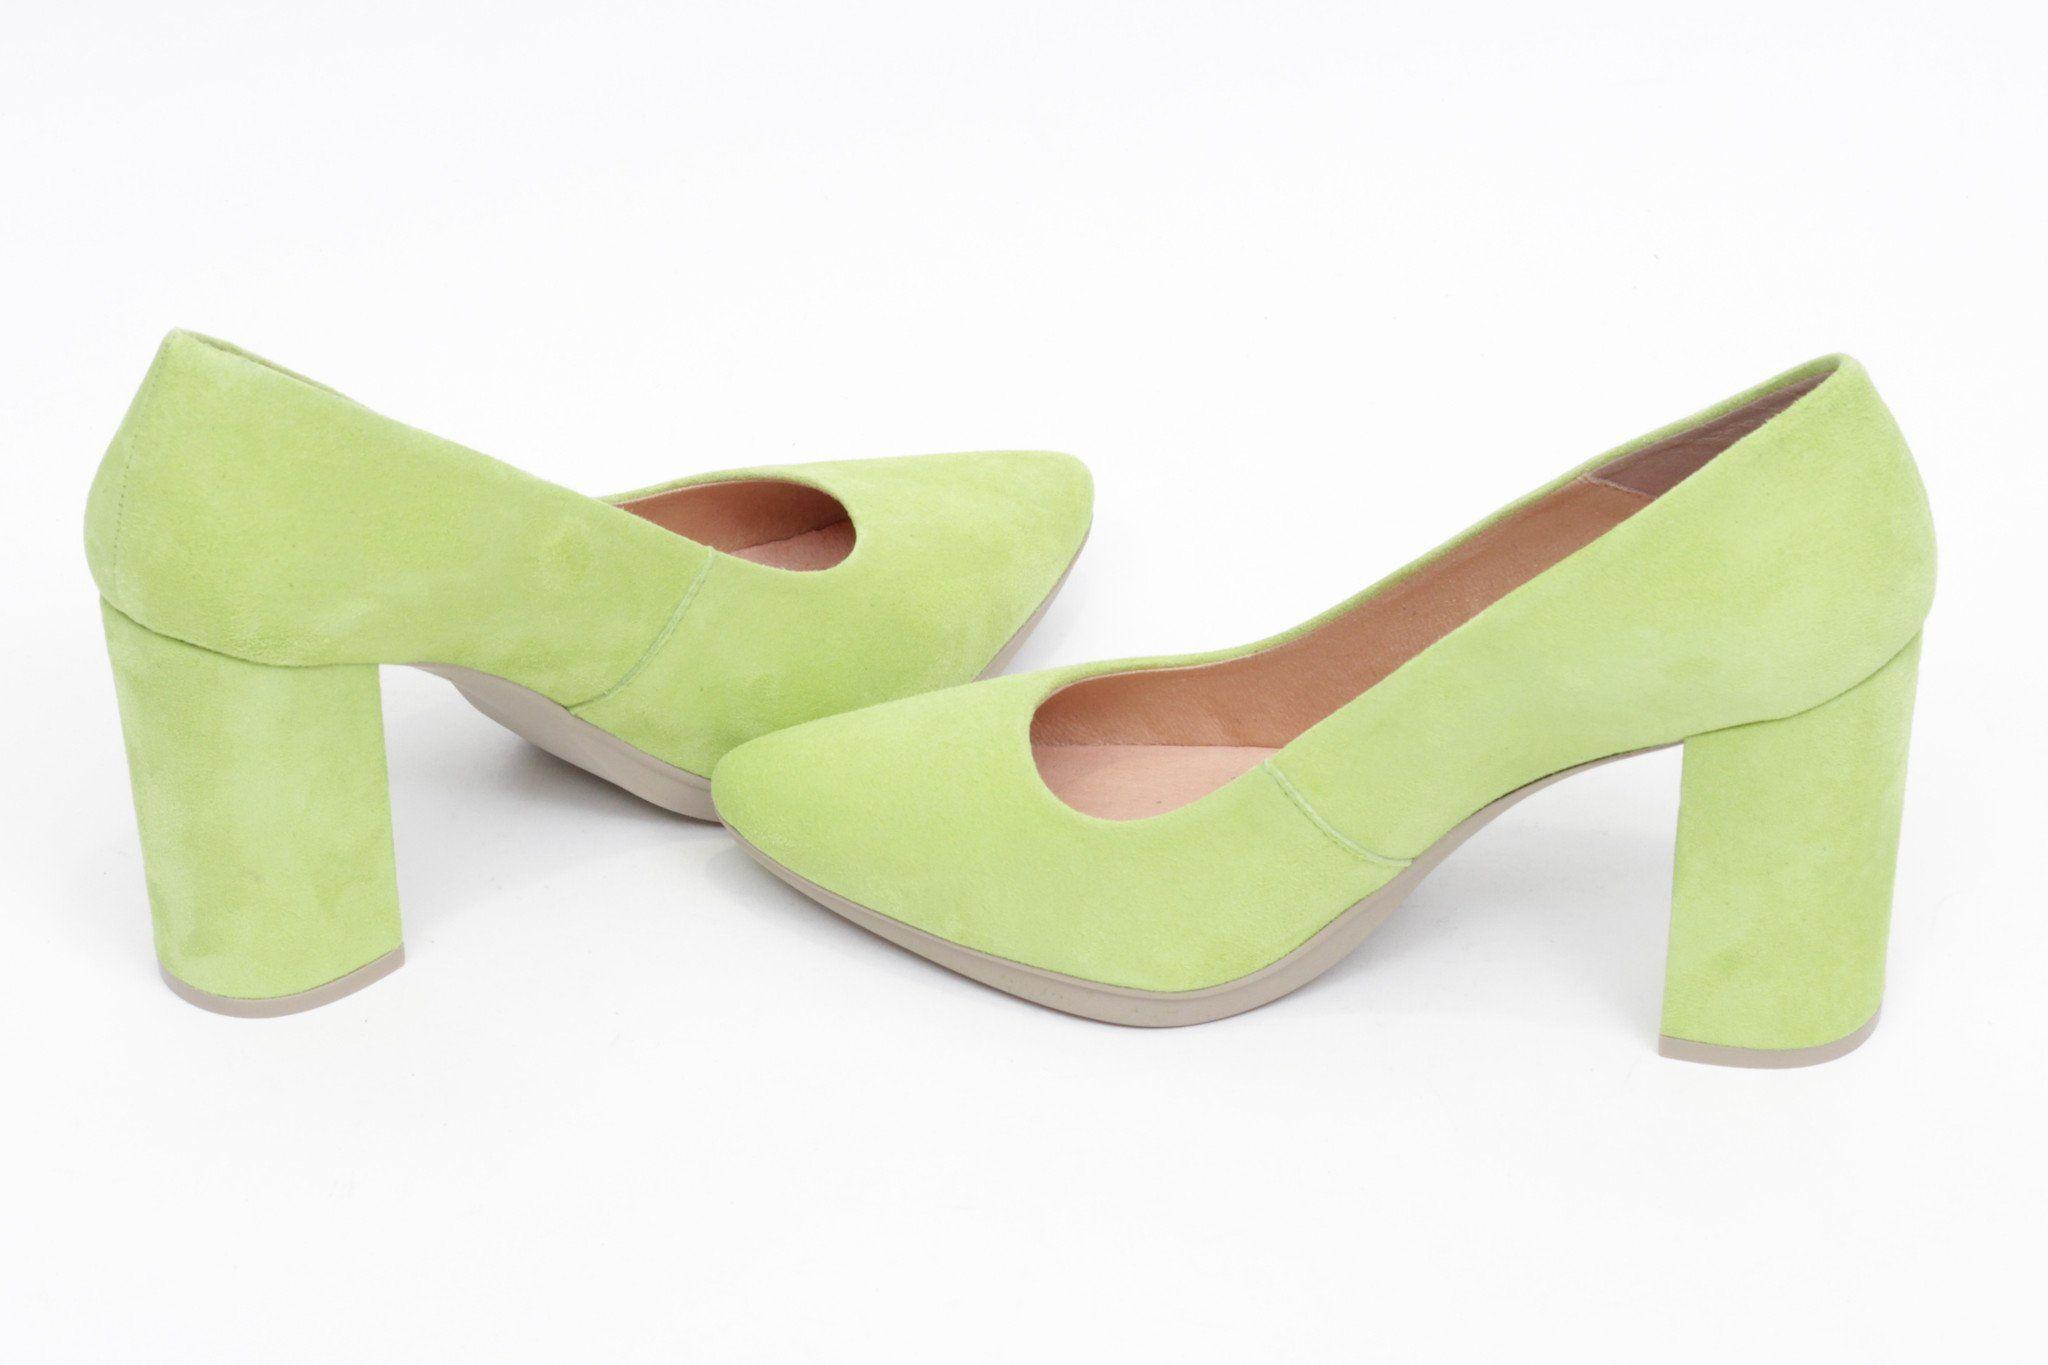 miMaO Urban verde lima - women high heels shoes lime green comfort pumps –  Zapato mujer salon de tacon azul vestir cómodo ab256064b39c